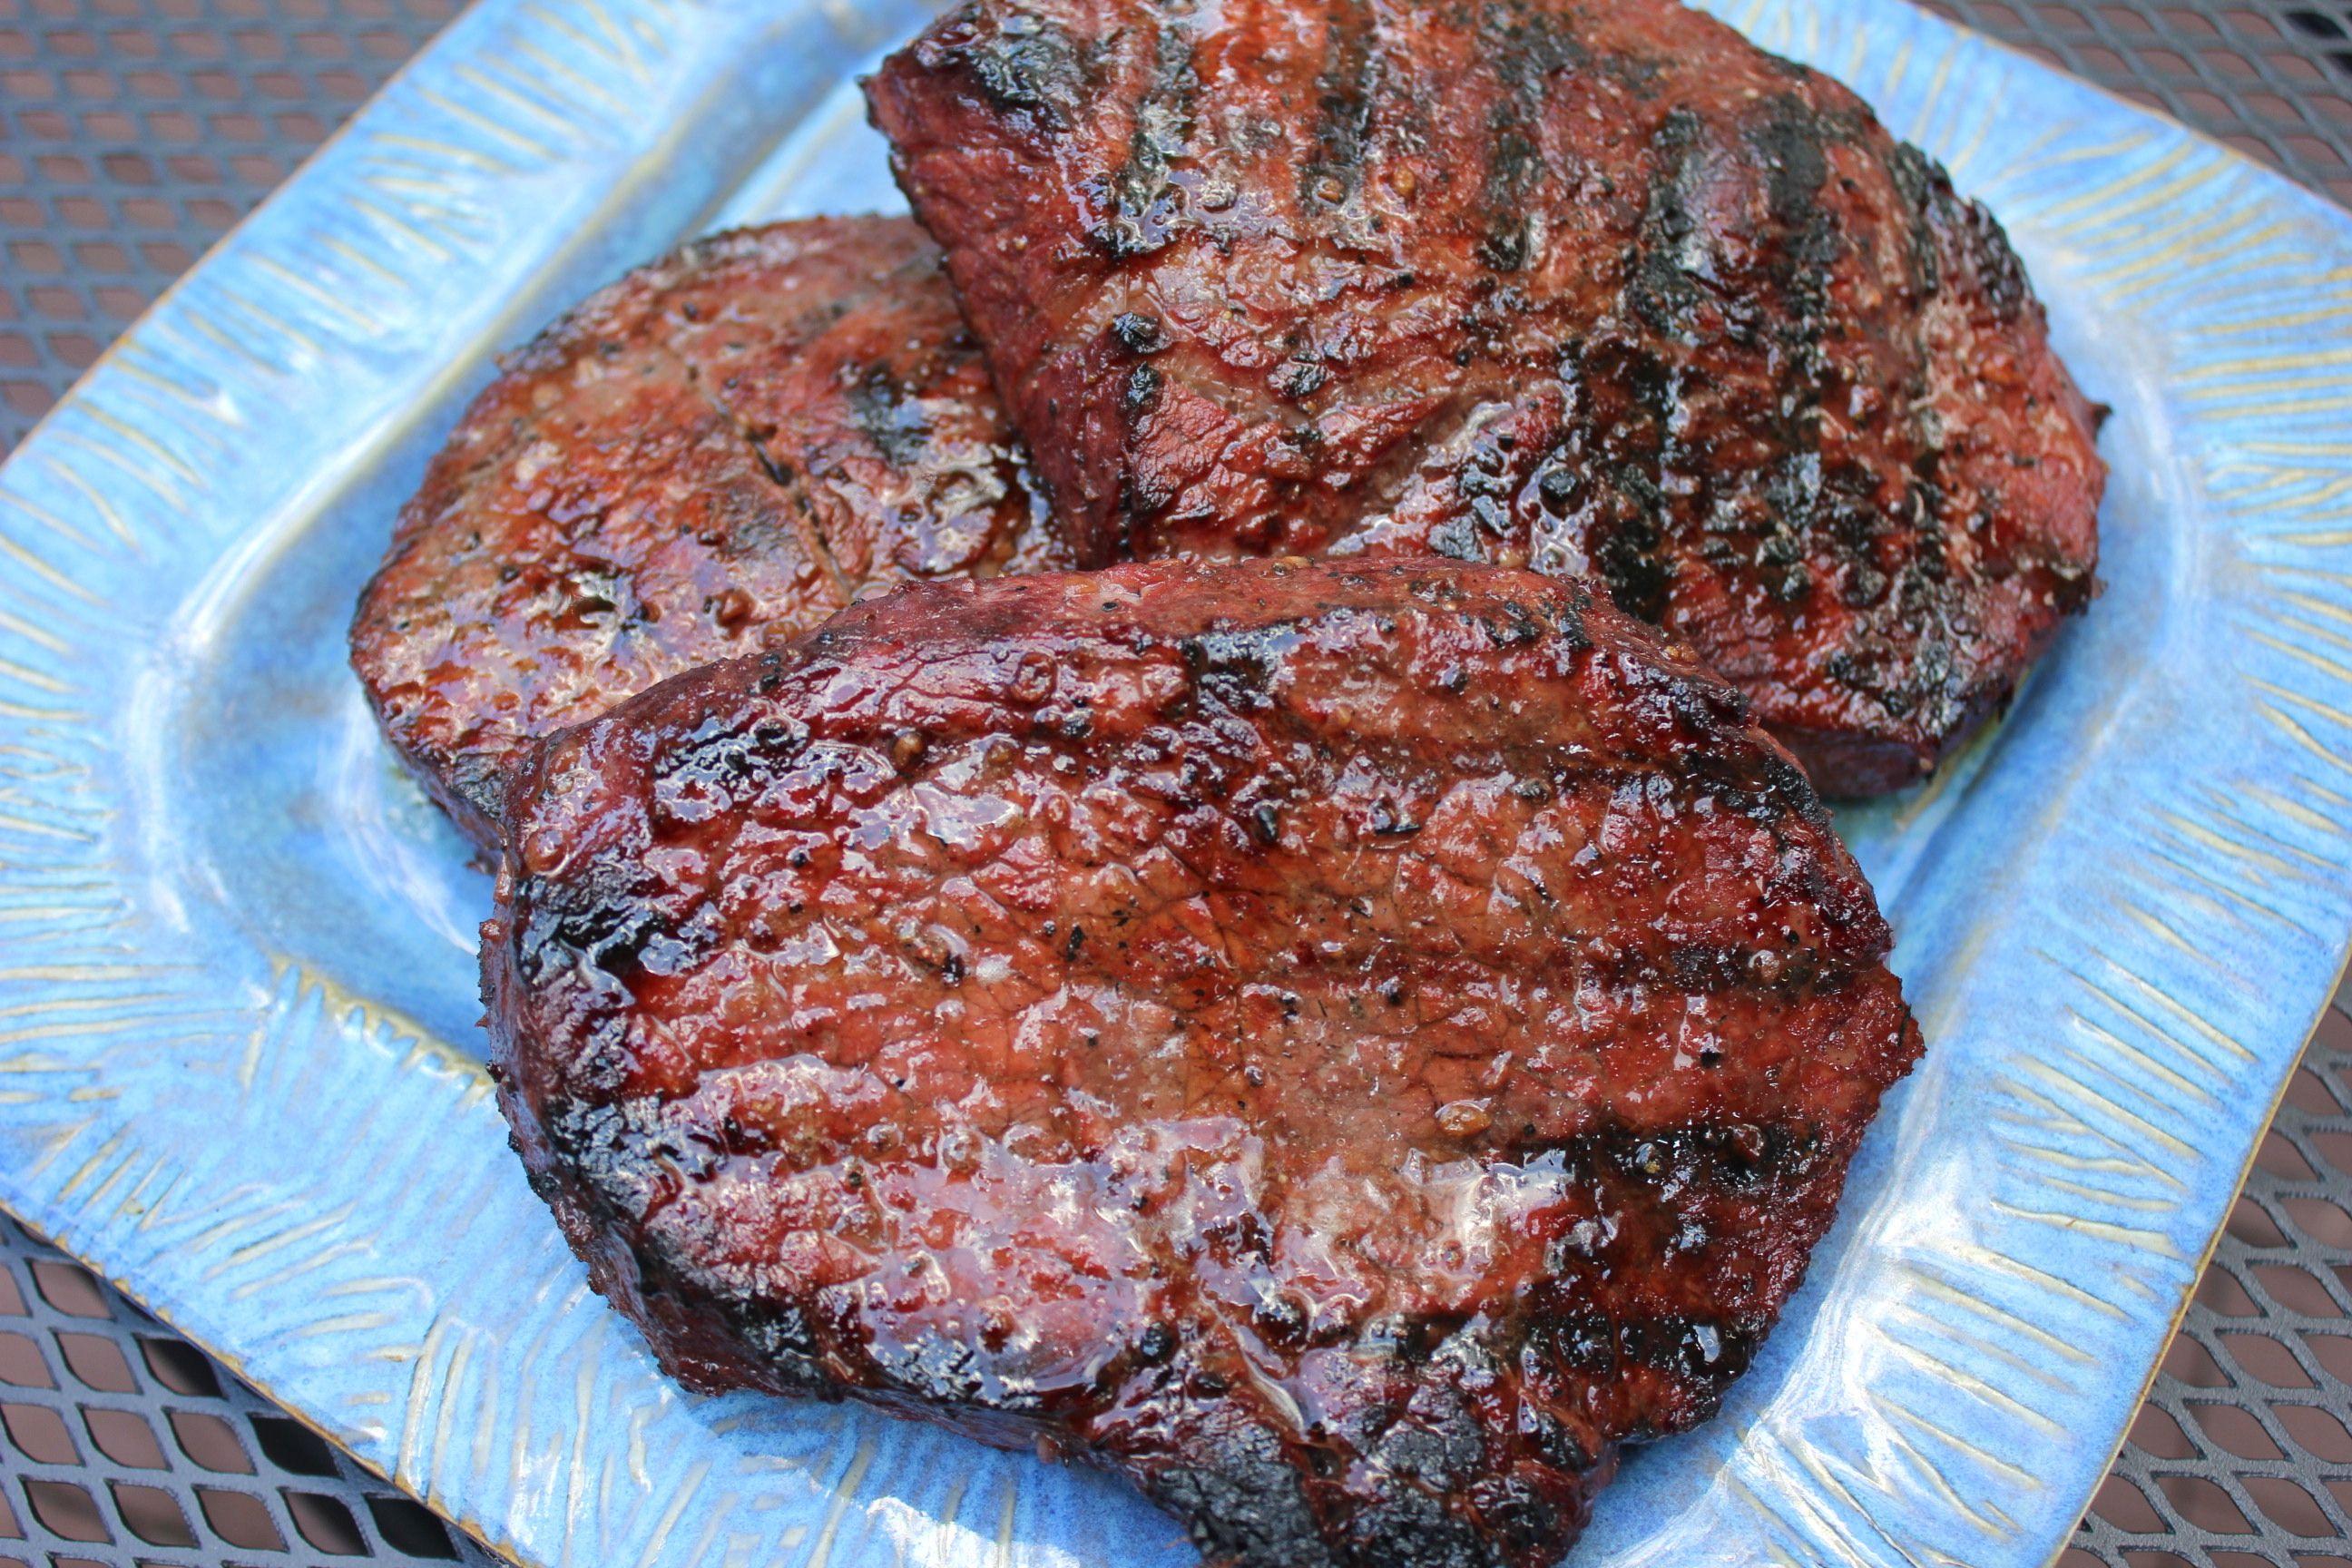 Grilled petite sirloin steak recipe sirloin steak